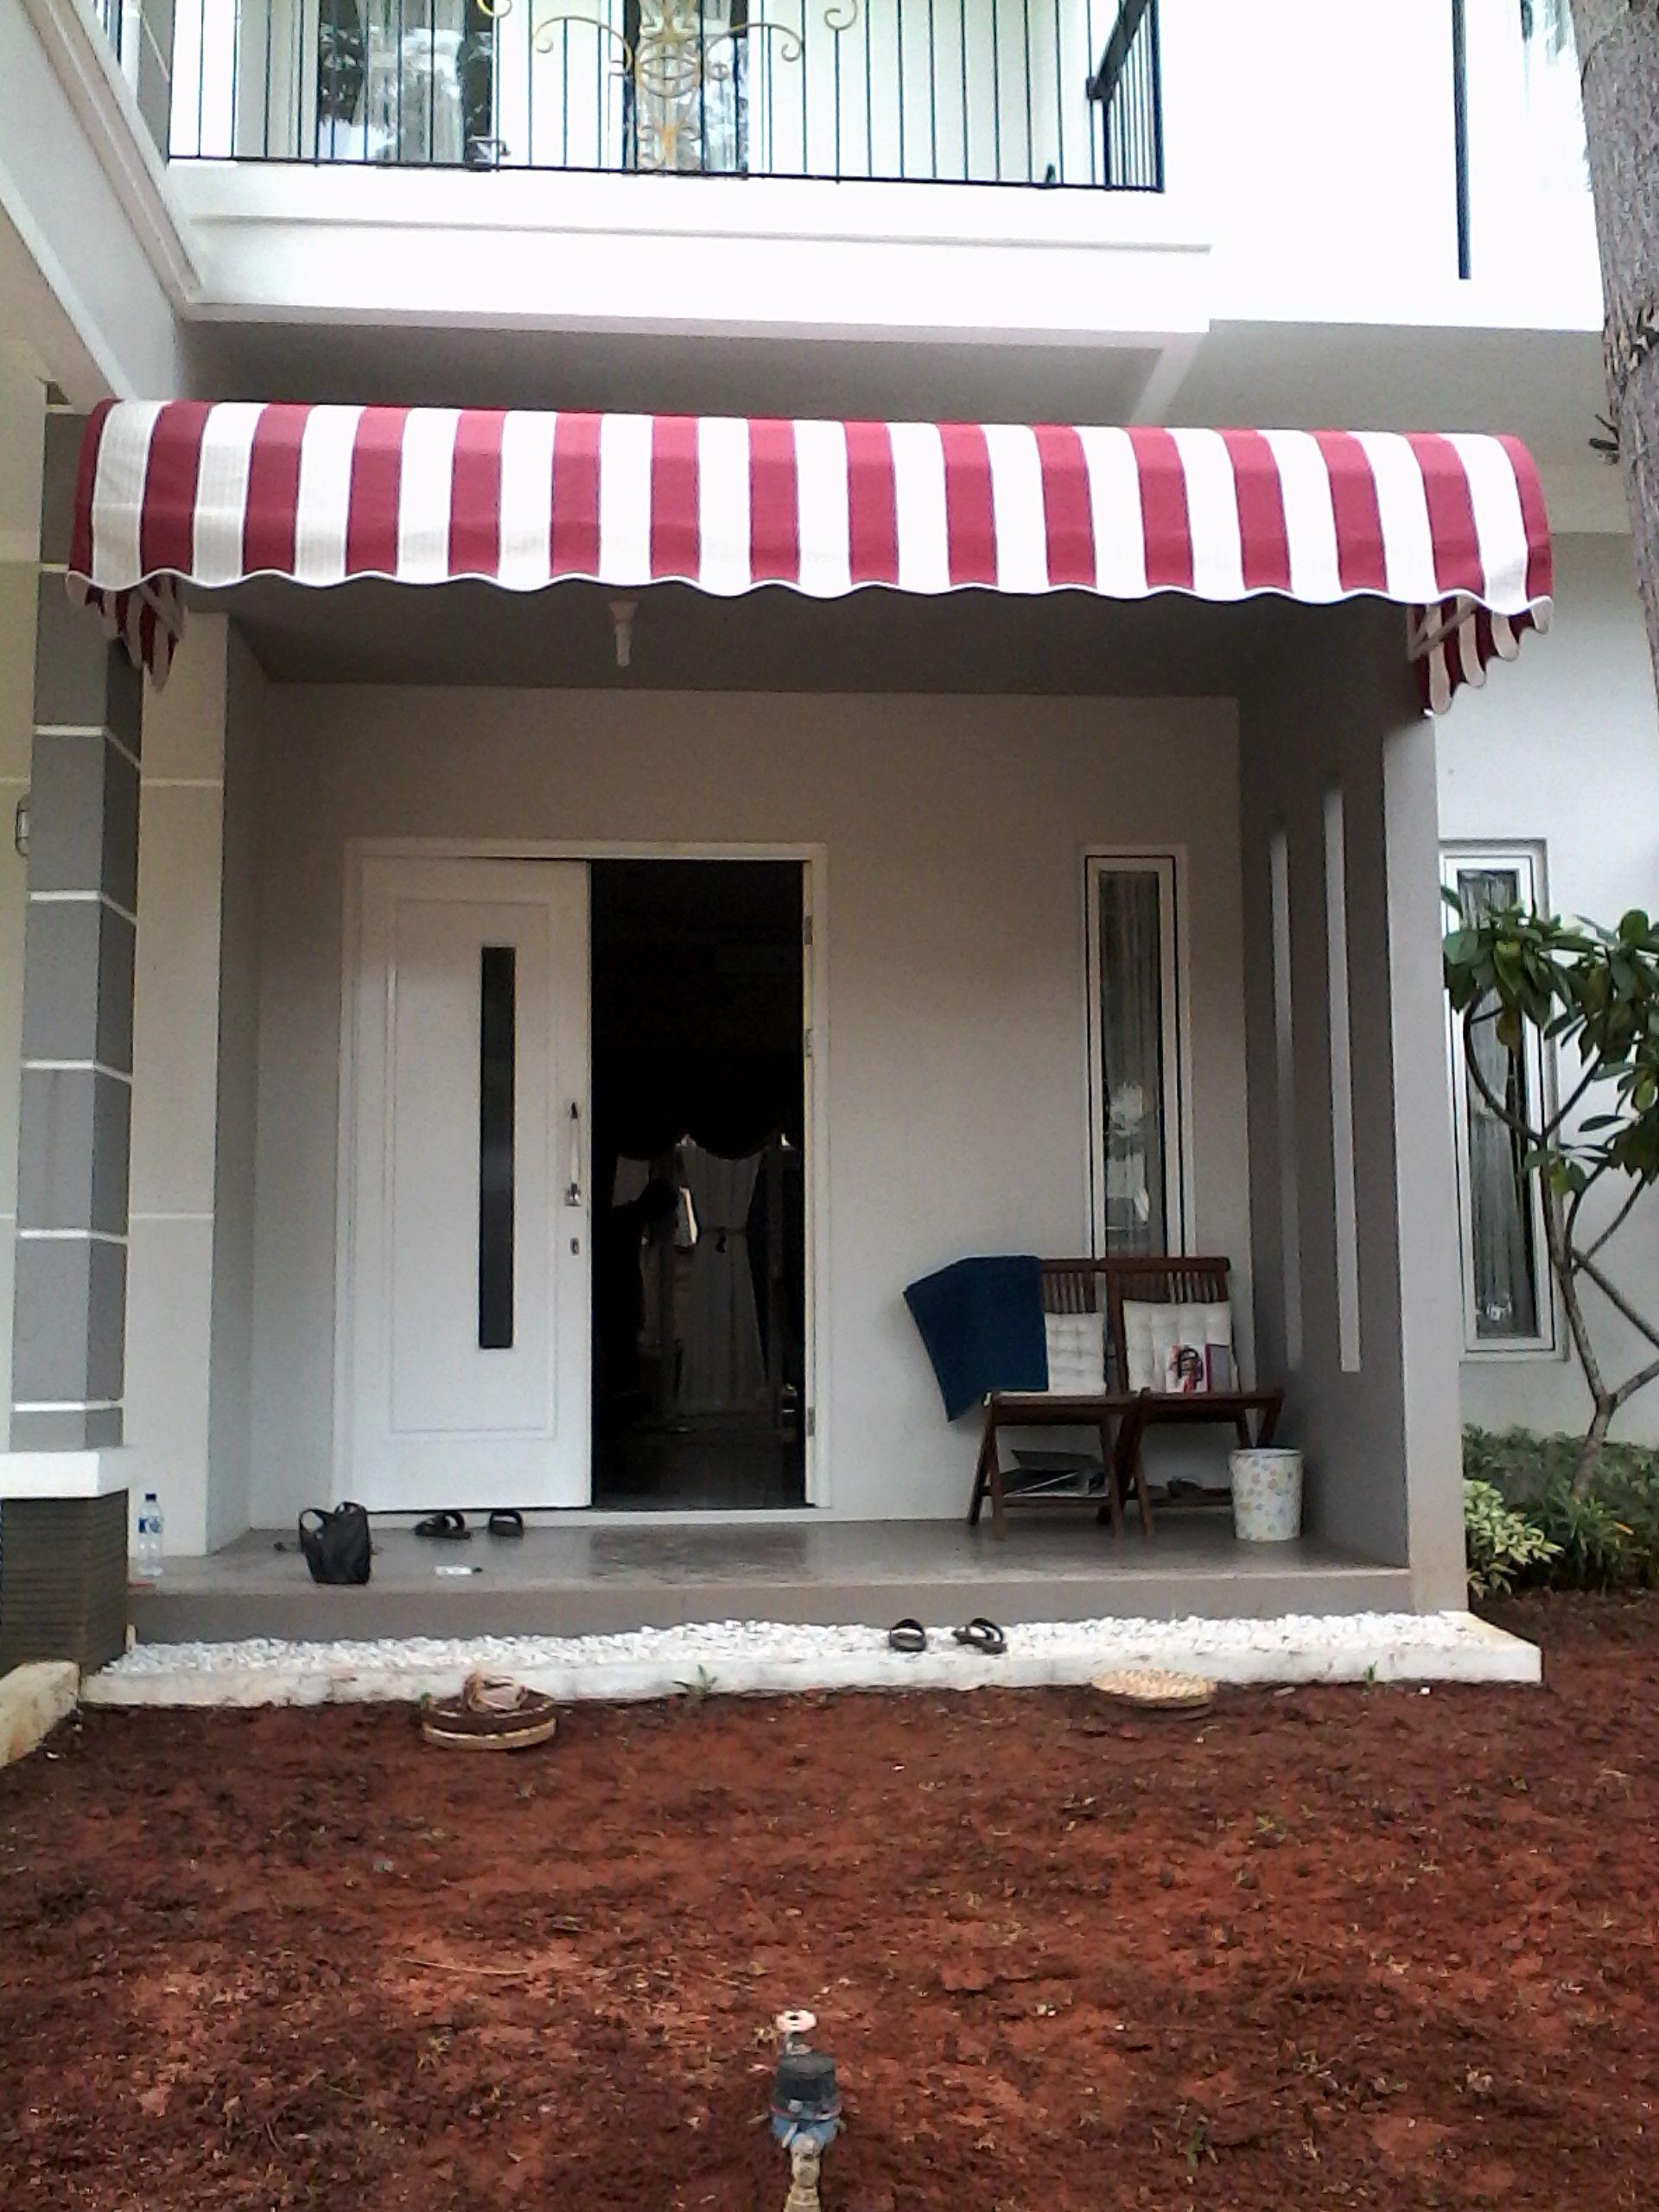 Canopy Kain Atau Tenda Awning Merupakan Pilihan Tepat Untuk Menambah Nilai Artistik Keindahan Pada Rumah Atau Toko Anda Rumah Rumah Kecil Kanopi